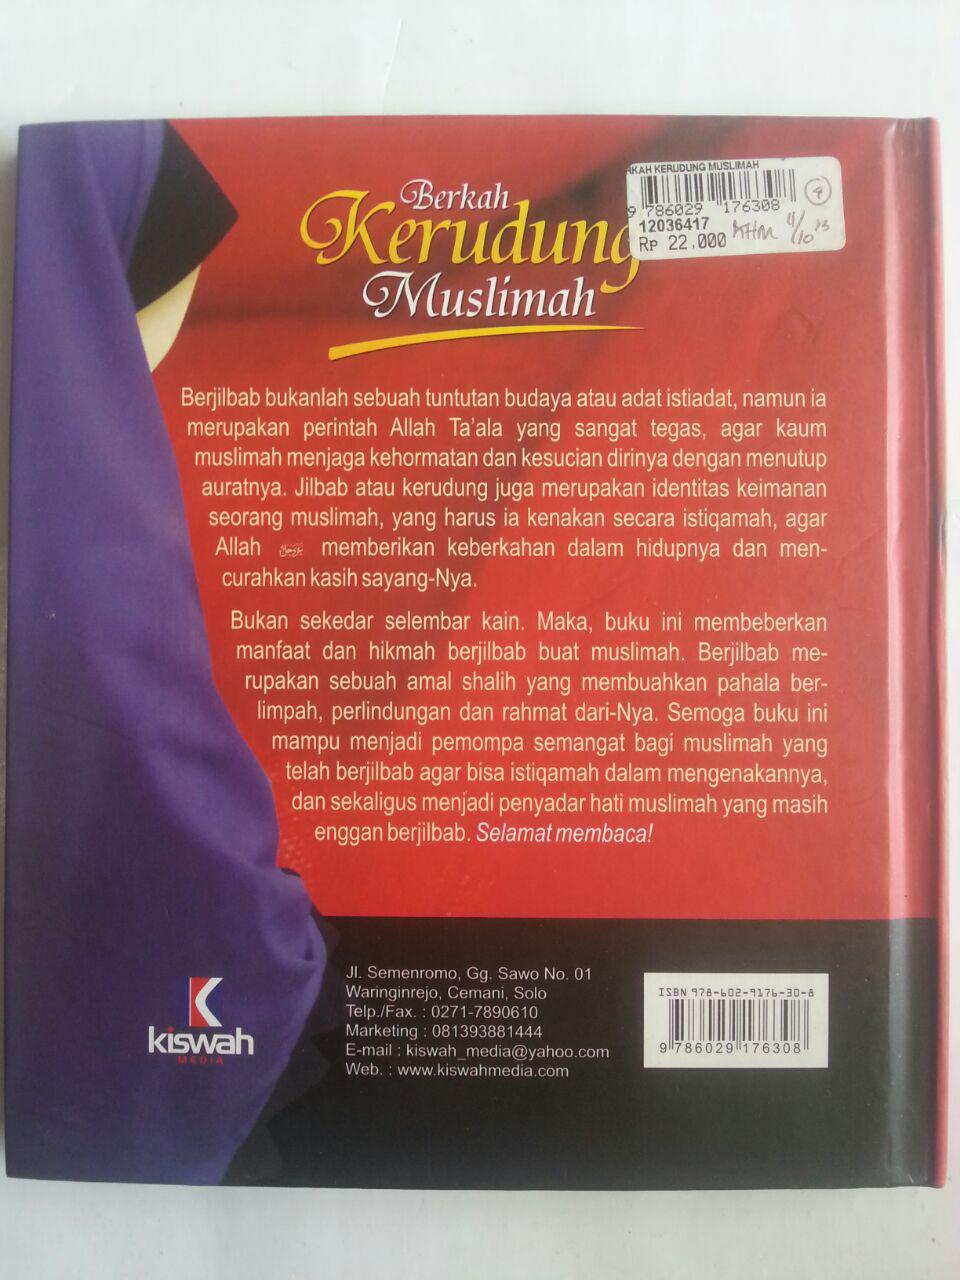 Buku Berkah Kerudung Muslimah Beragam Manfaat Berjilbab cover